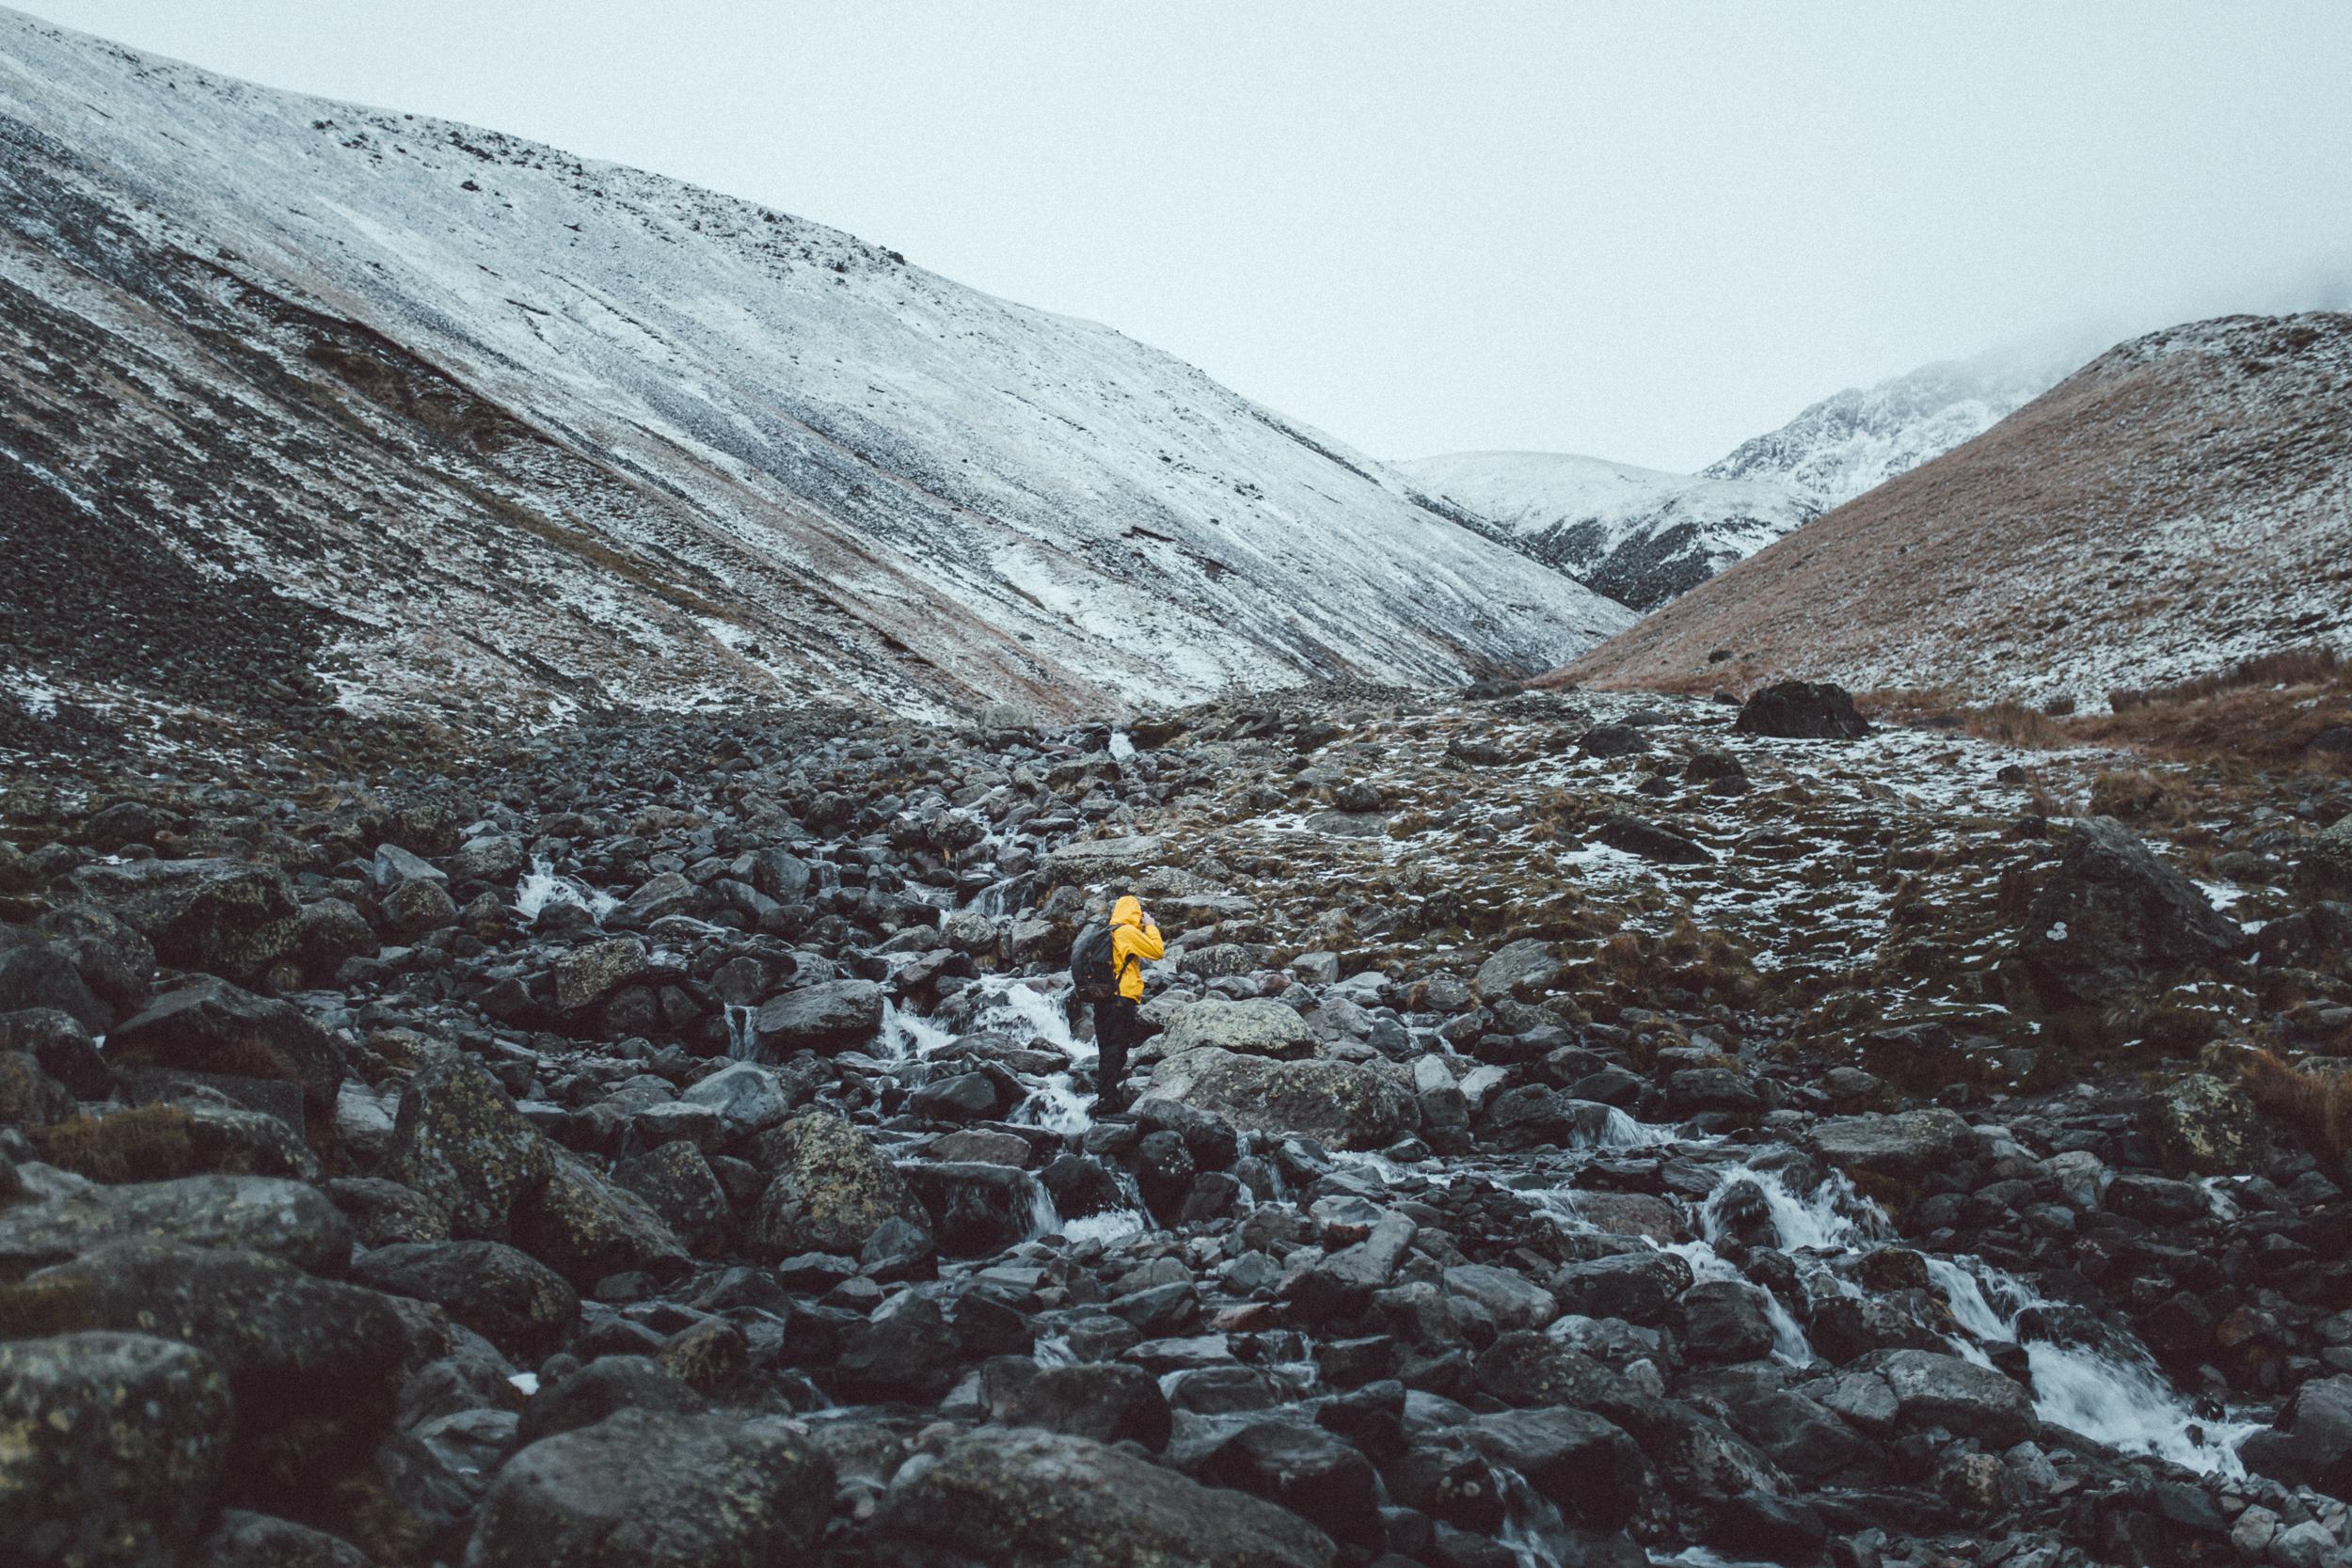 LakeDistrictNov2017_ByTomKahler_Lowres (10 of 63).jpg